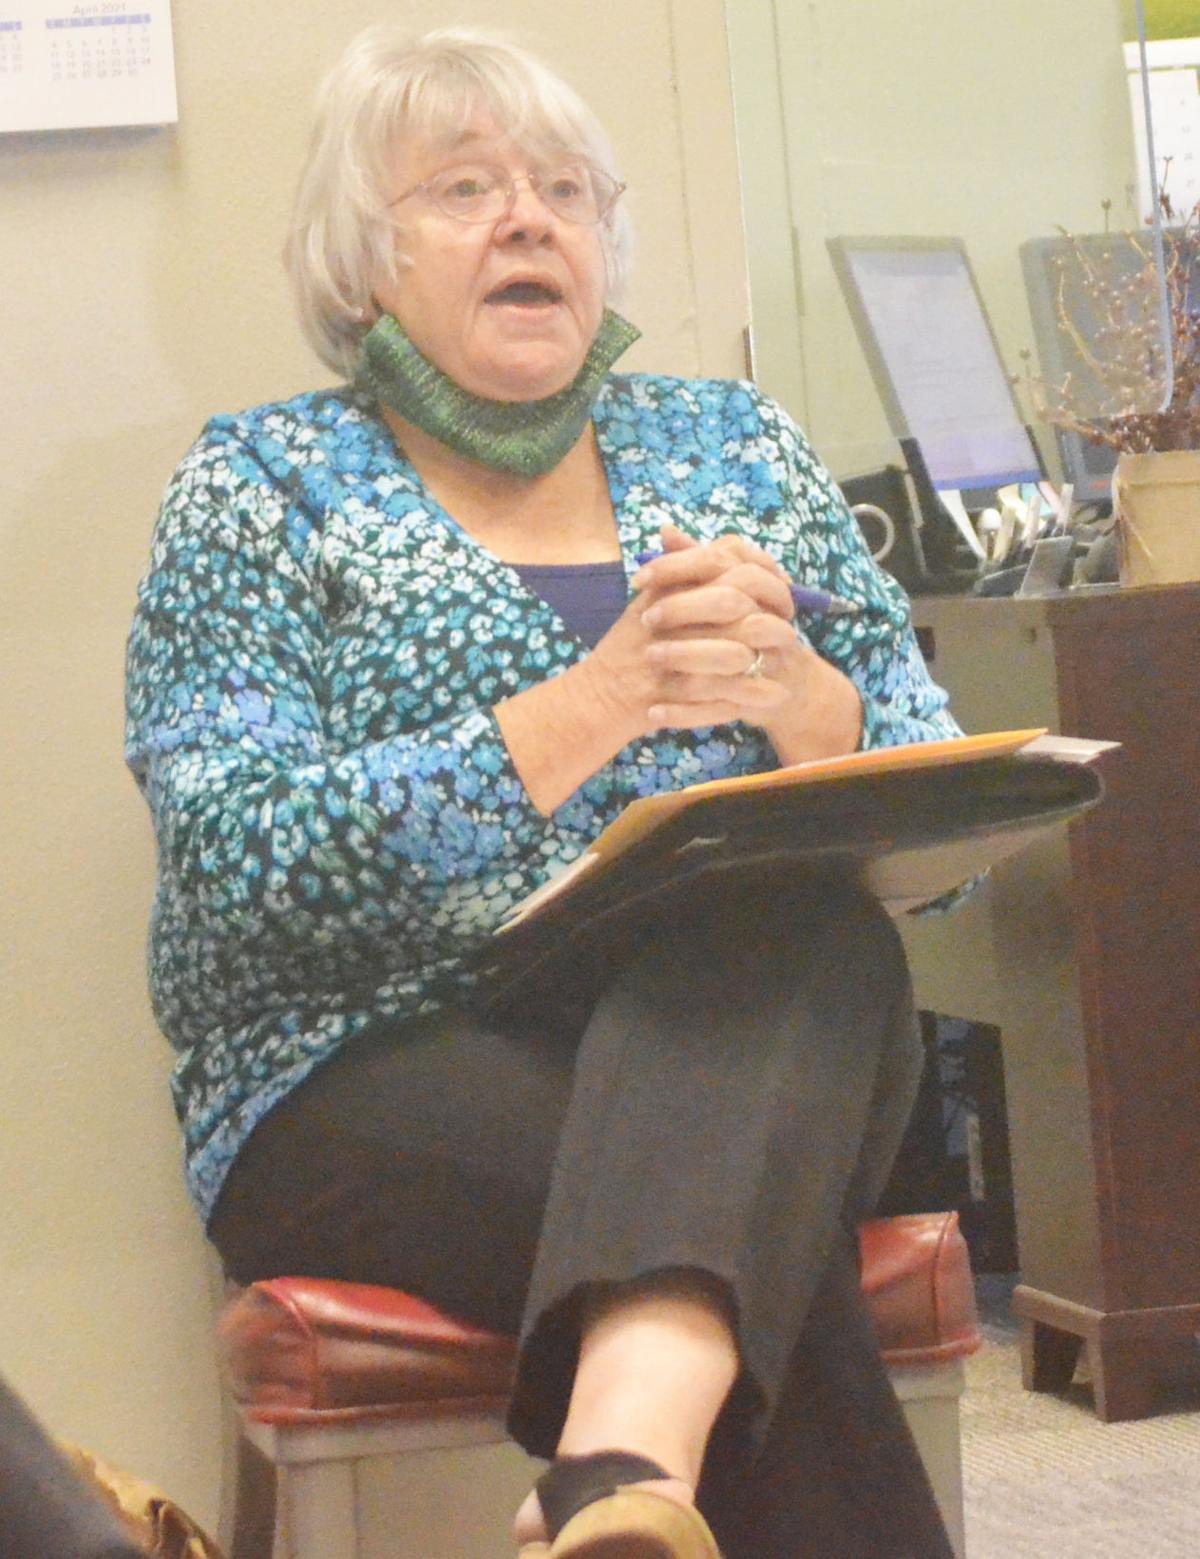 Kathy Cancilla